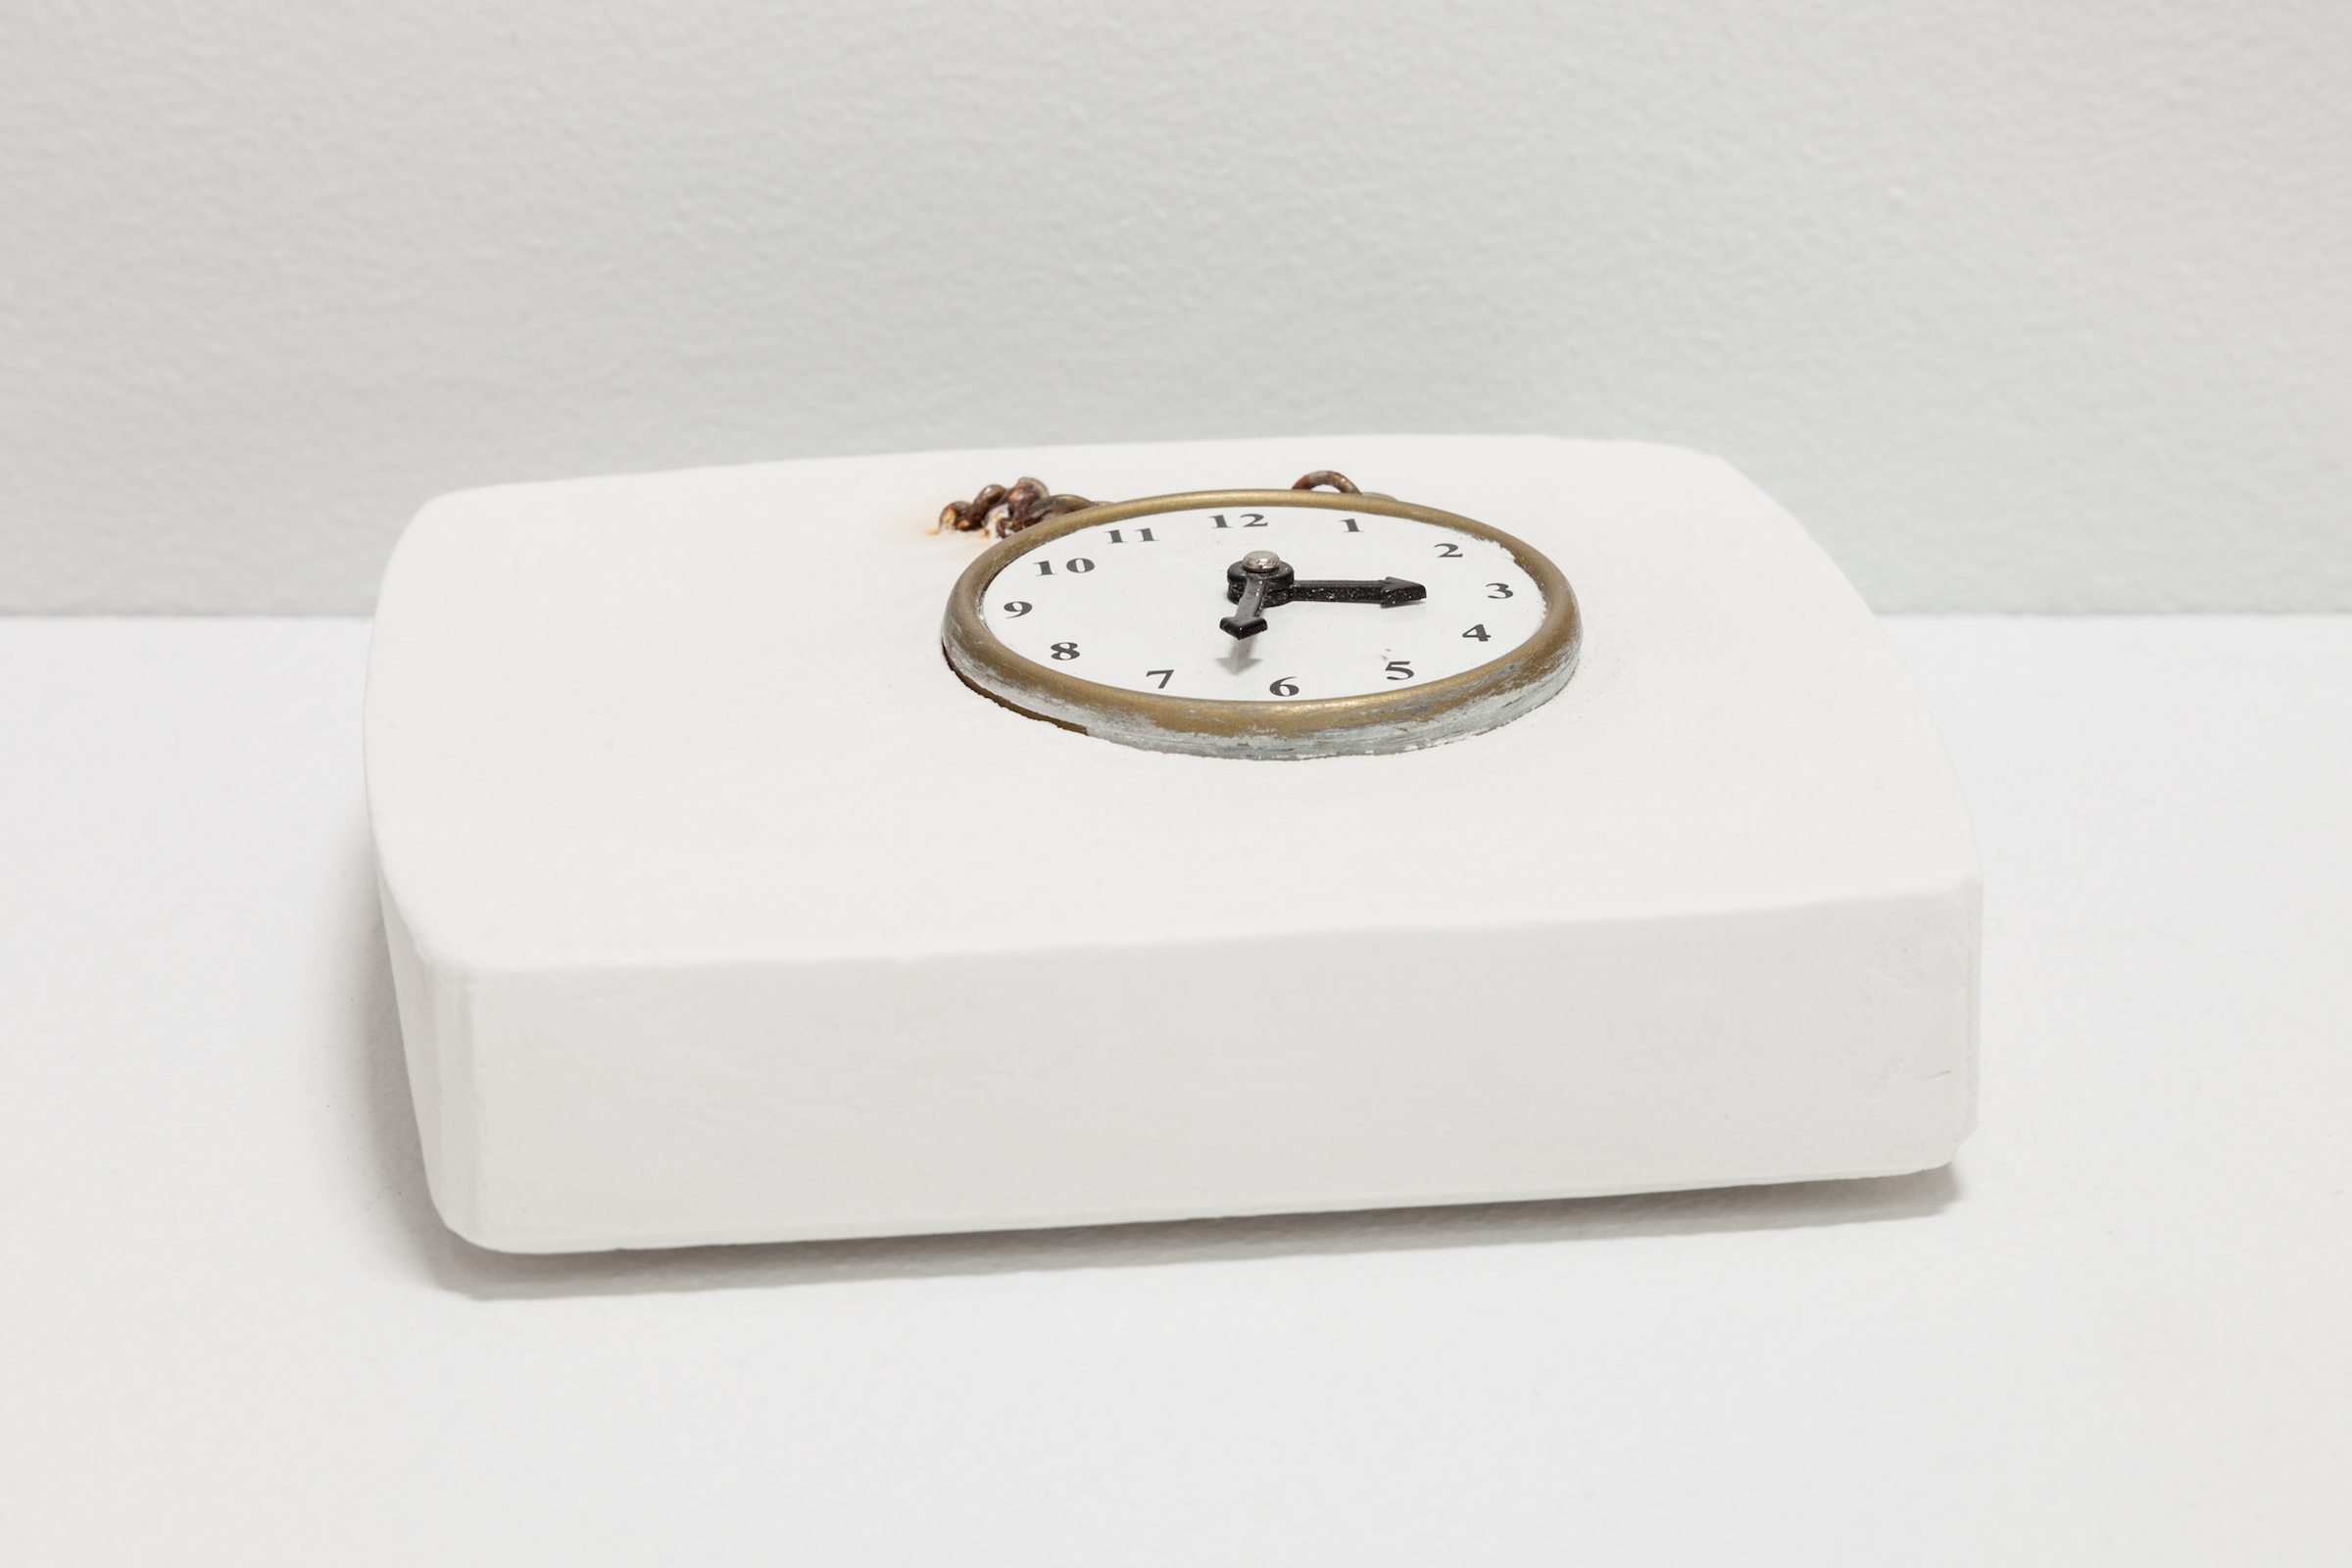 Deborah Hede,  Pocket Watch , 2018, toy watch, plaster, 1 ¼ × 4 × 4 in